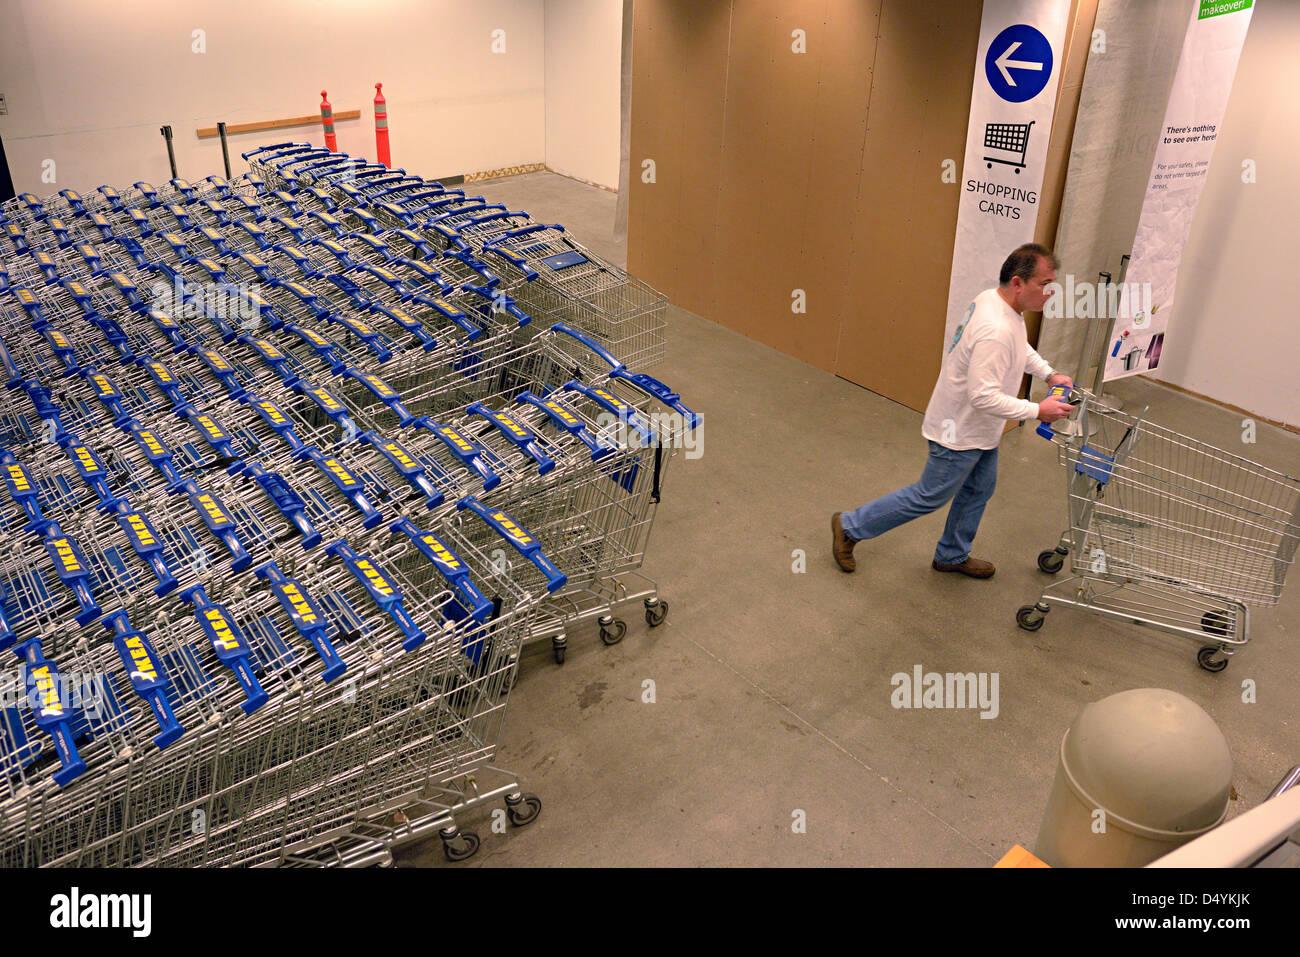 Ikea Trolleys San Francisco Stock Photo: 54697851   Alamy